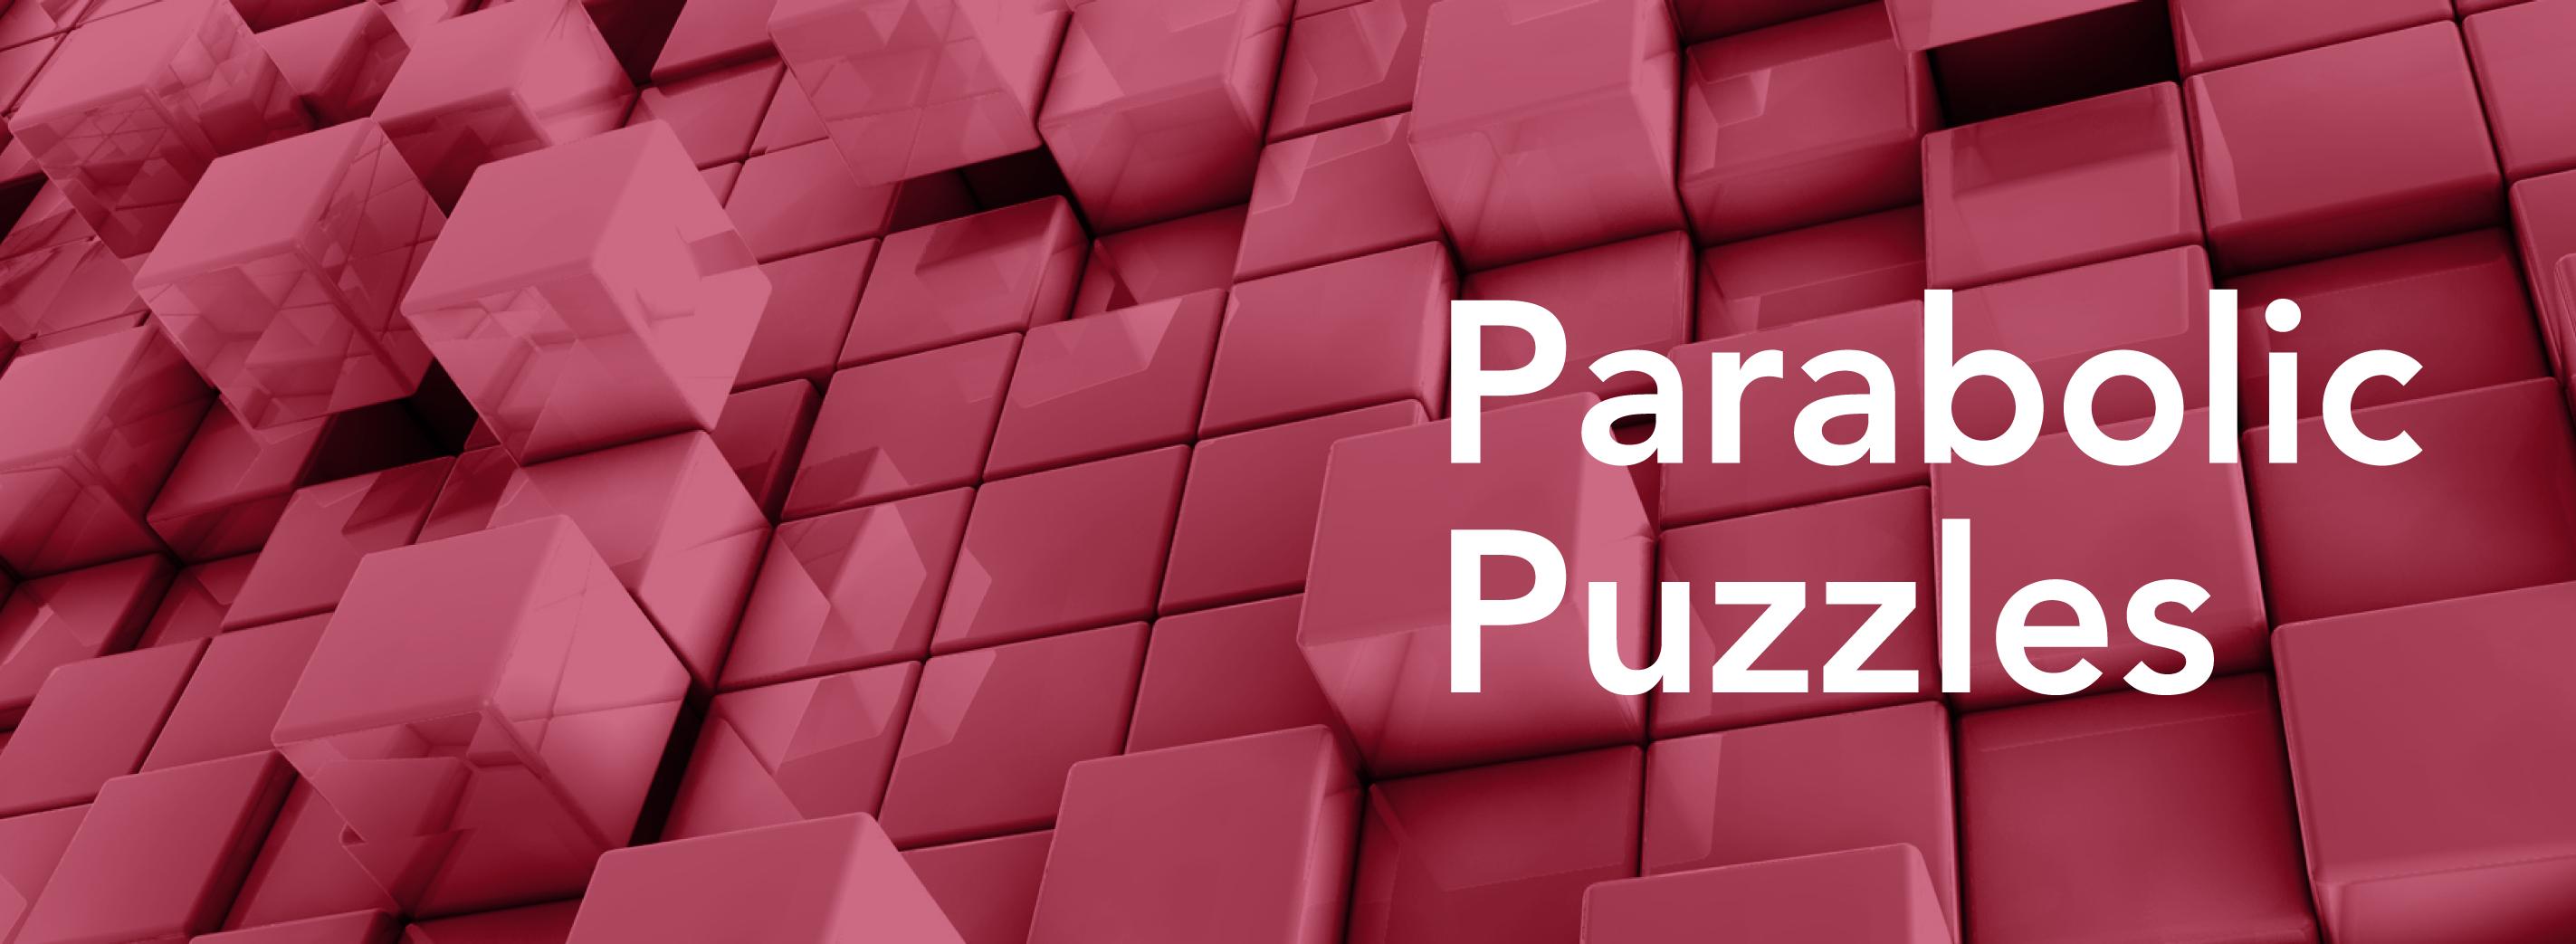 Parabolic Puzzles